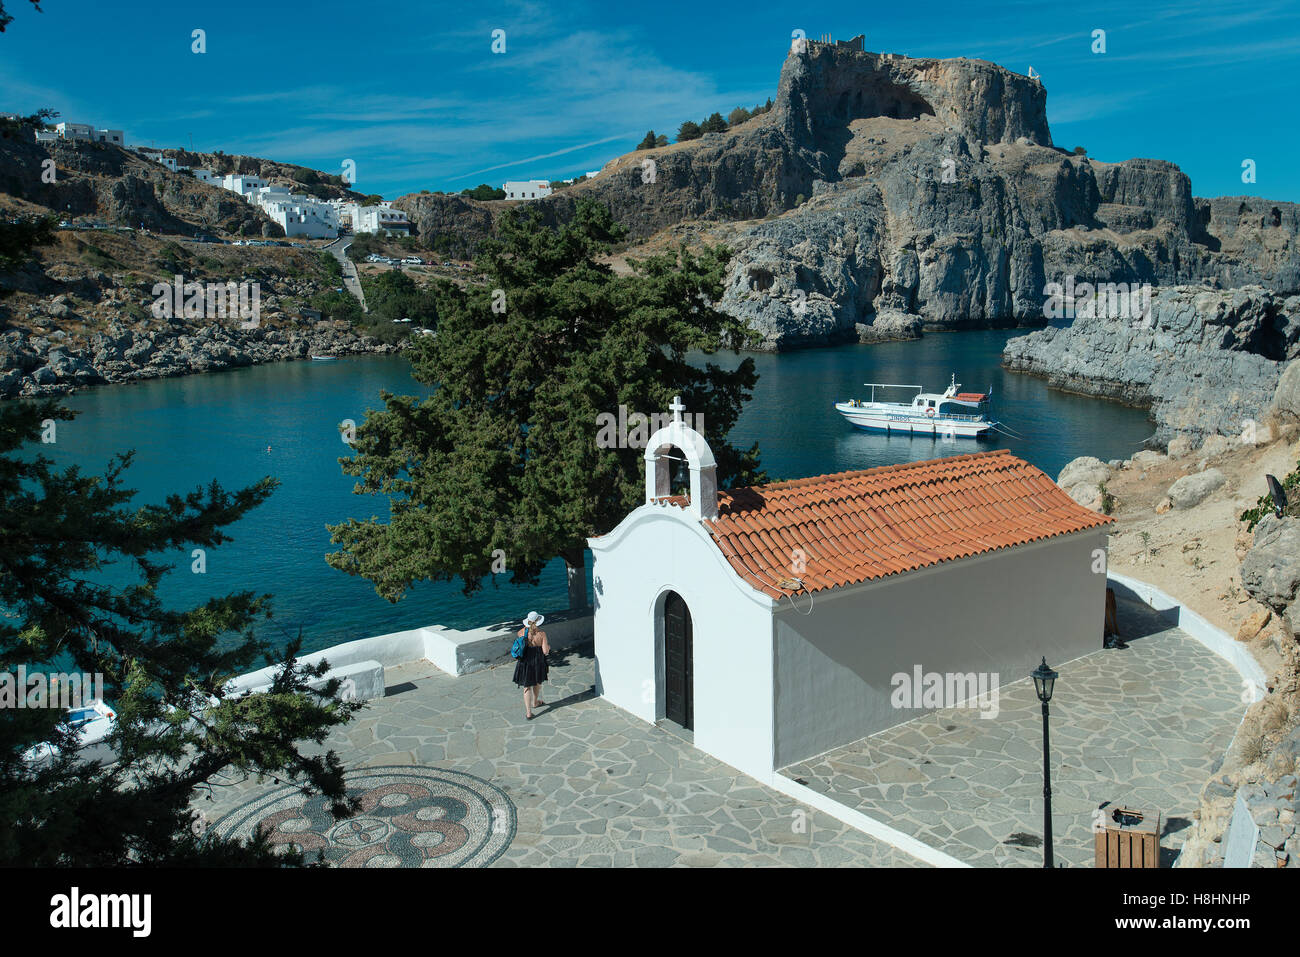 Chapel, St Pauls Bay, Lindos, Rhodes, Greece Stock Photo